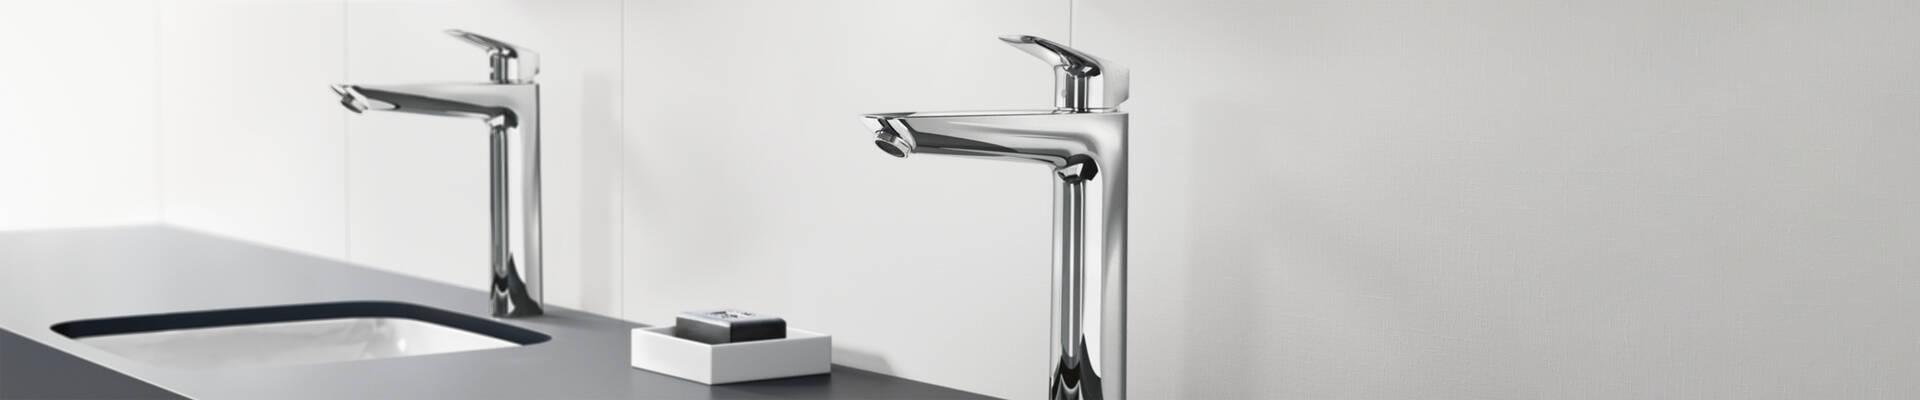 Gut gemocht hansgrohe Logis bathroom taps: modern, affordable, good JE86